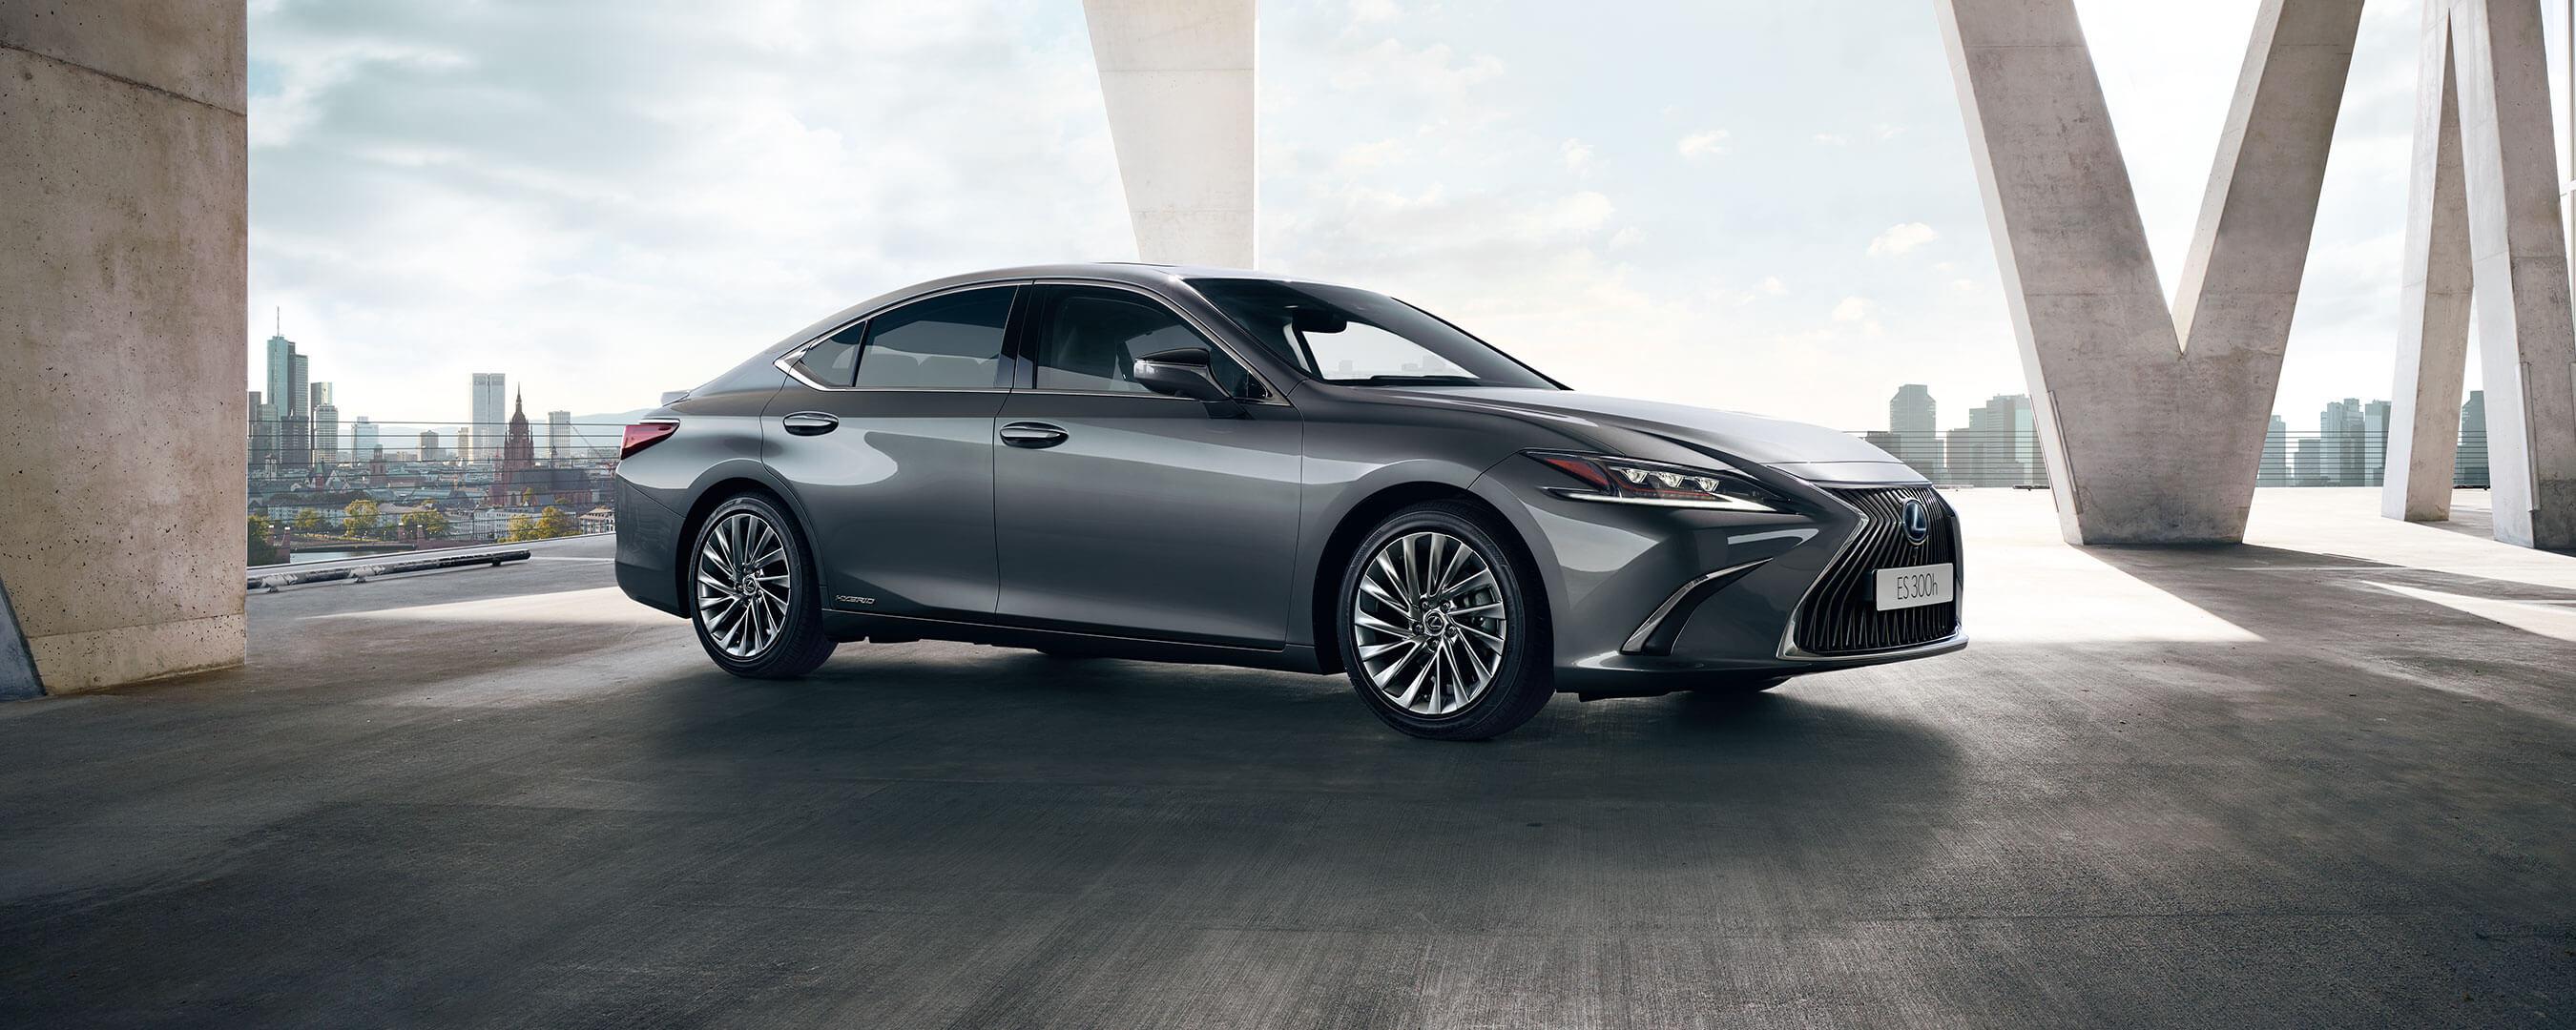 2019 lexus es hybrid experience hero exterior front